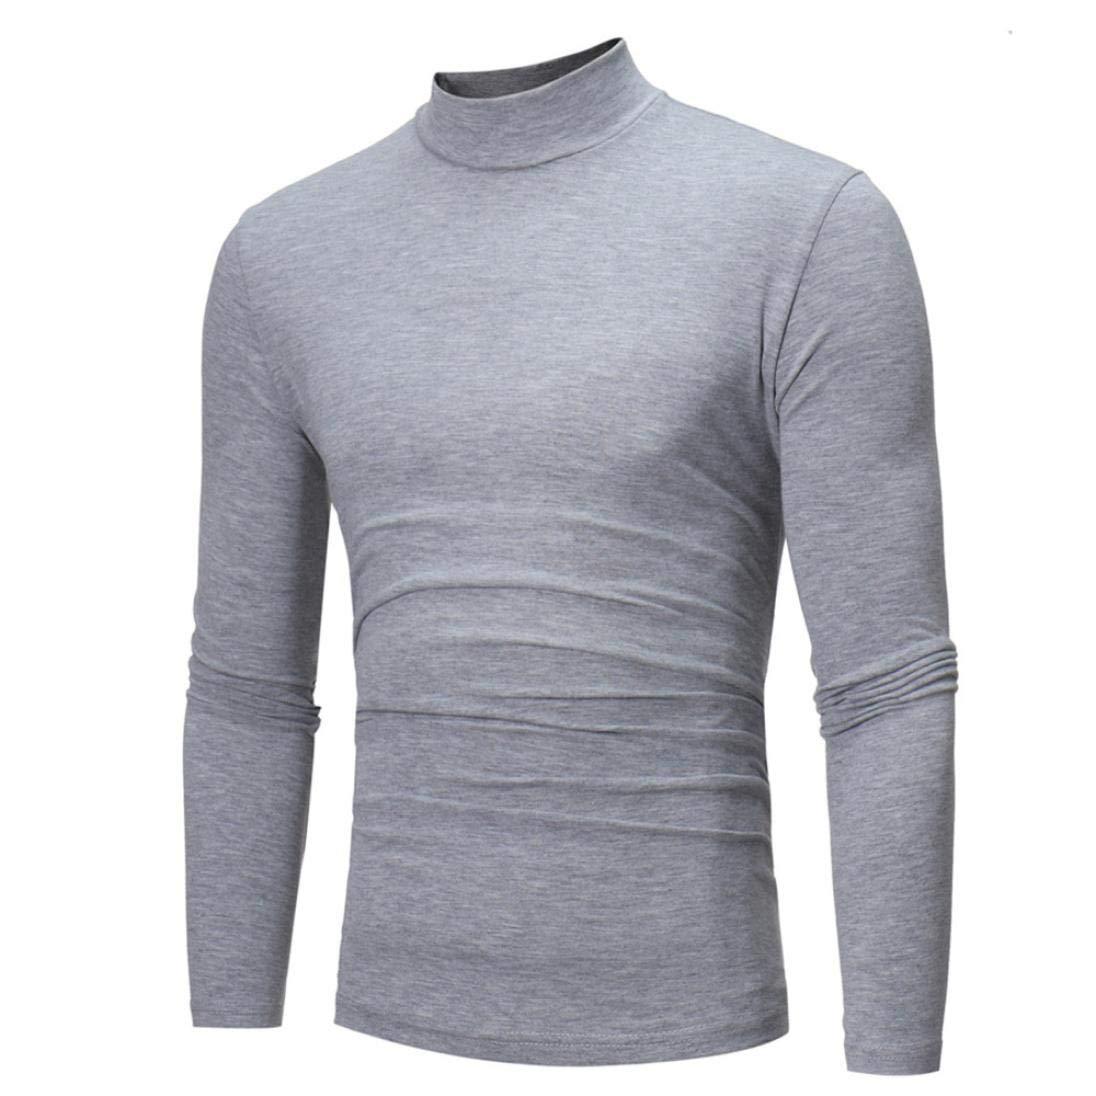 DAYSEVENTH Clearance Men's Autumn Winter Pure Color Turtleneck Long Sleeve T-Shirt Top Blouse 442659